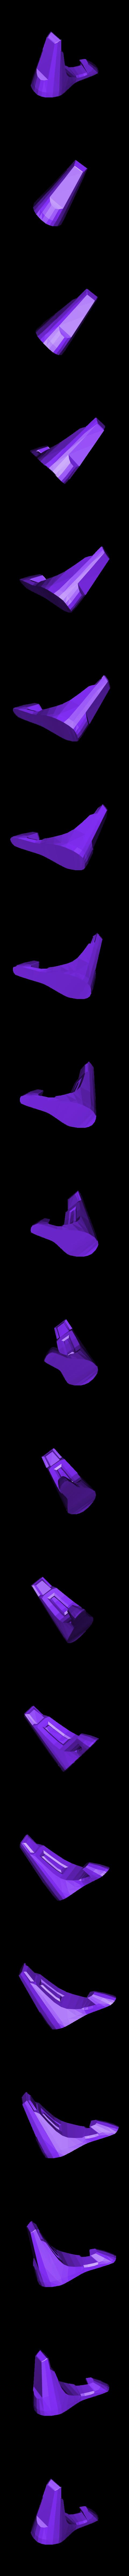 Fortnite purple omega png